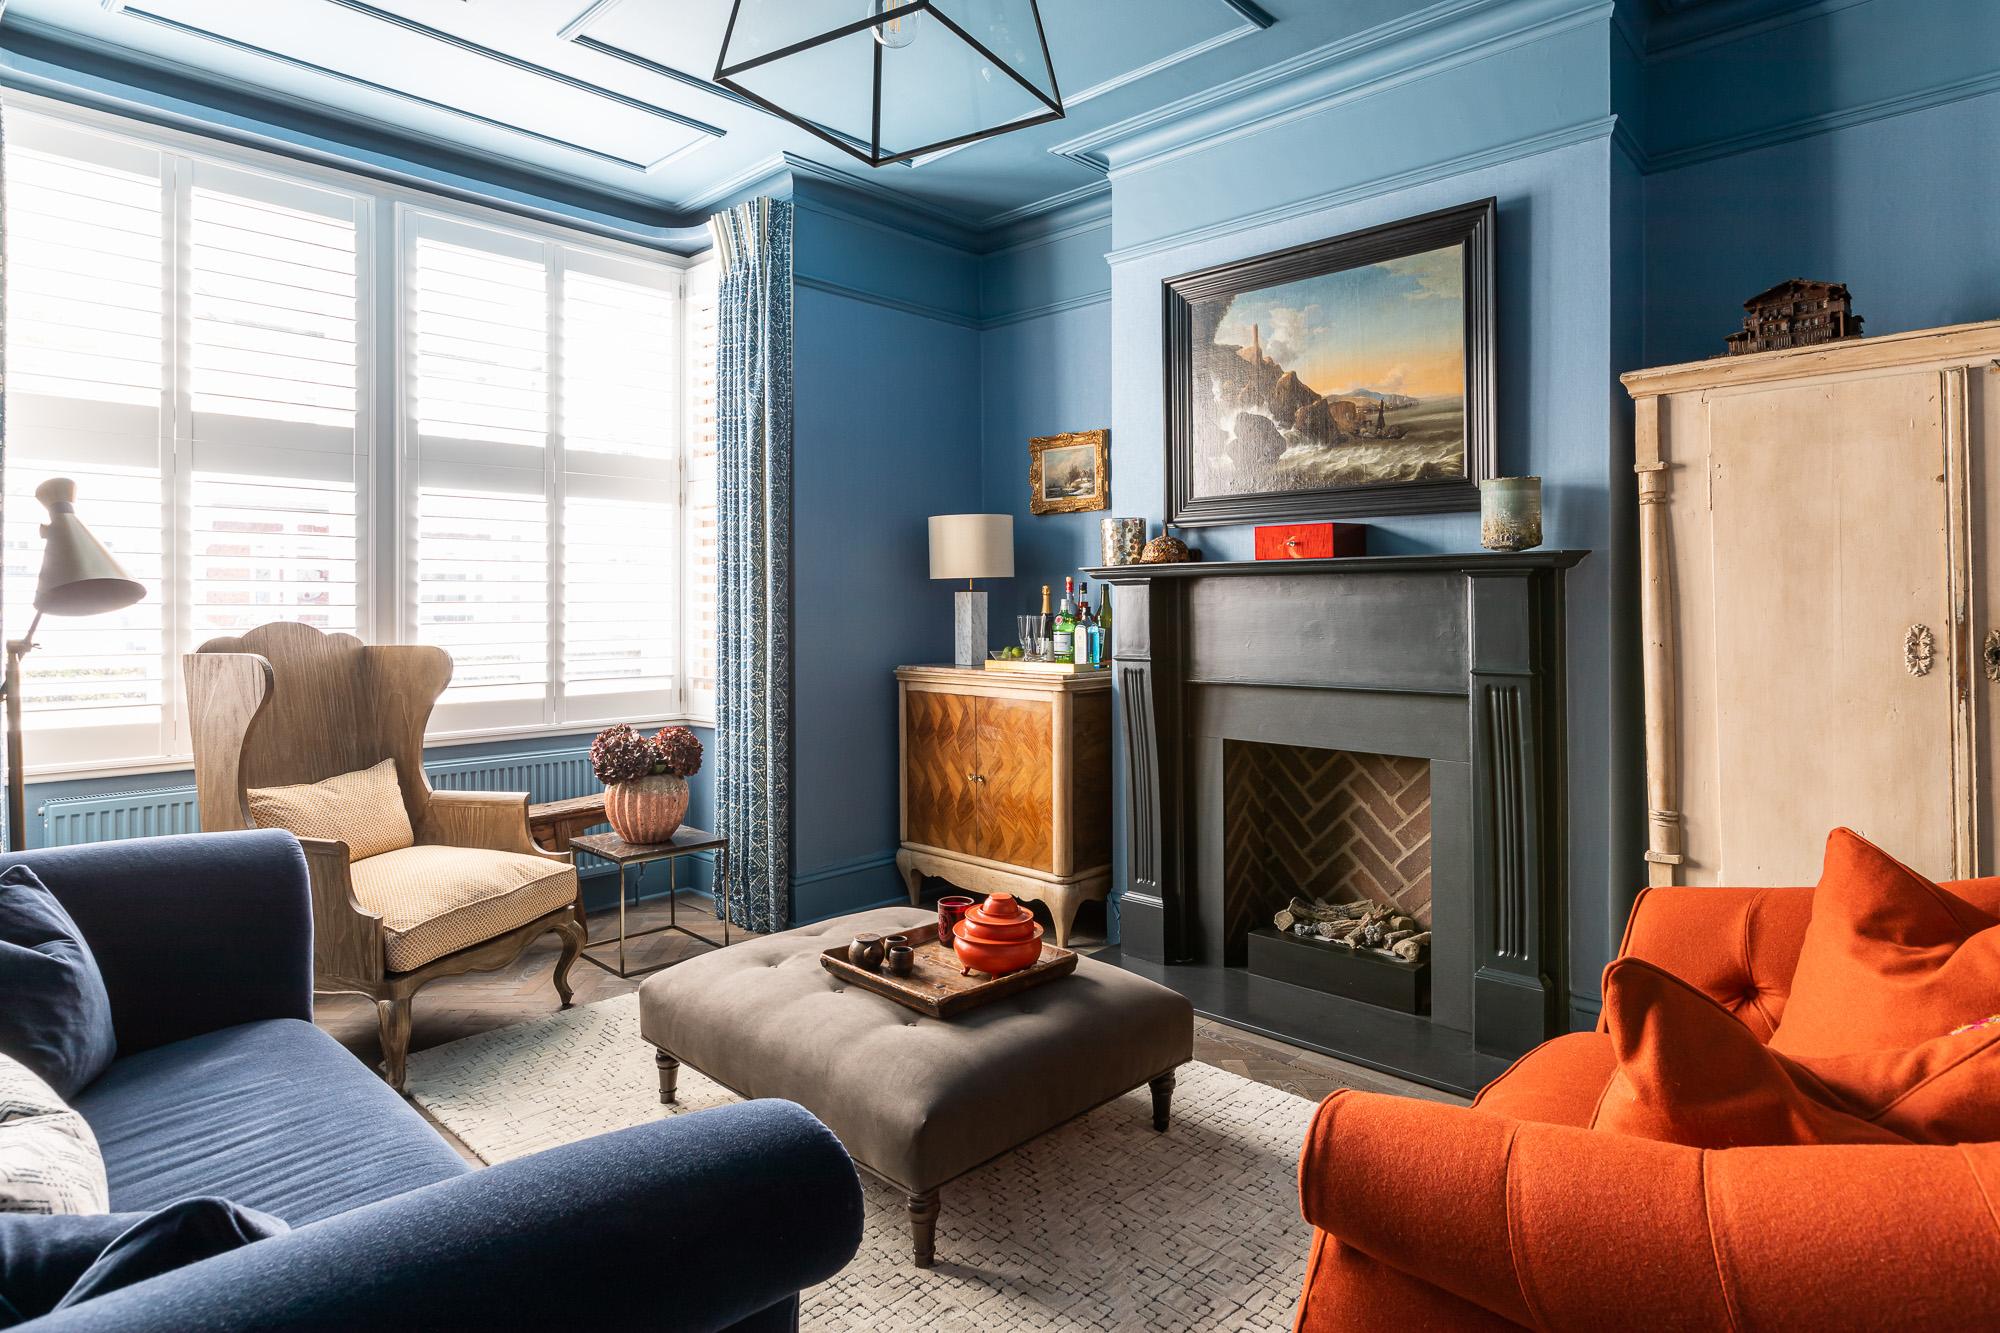 jonathan bond, interior photographer, living room ottoman, clapham, london